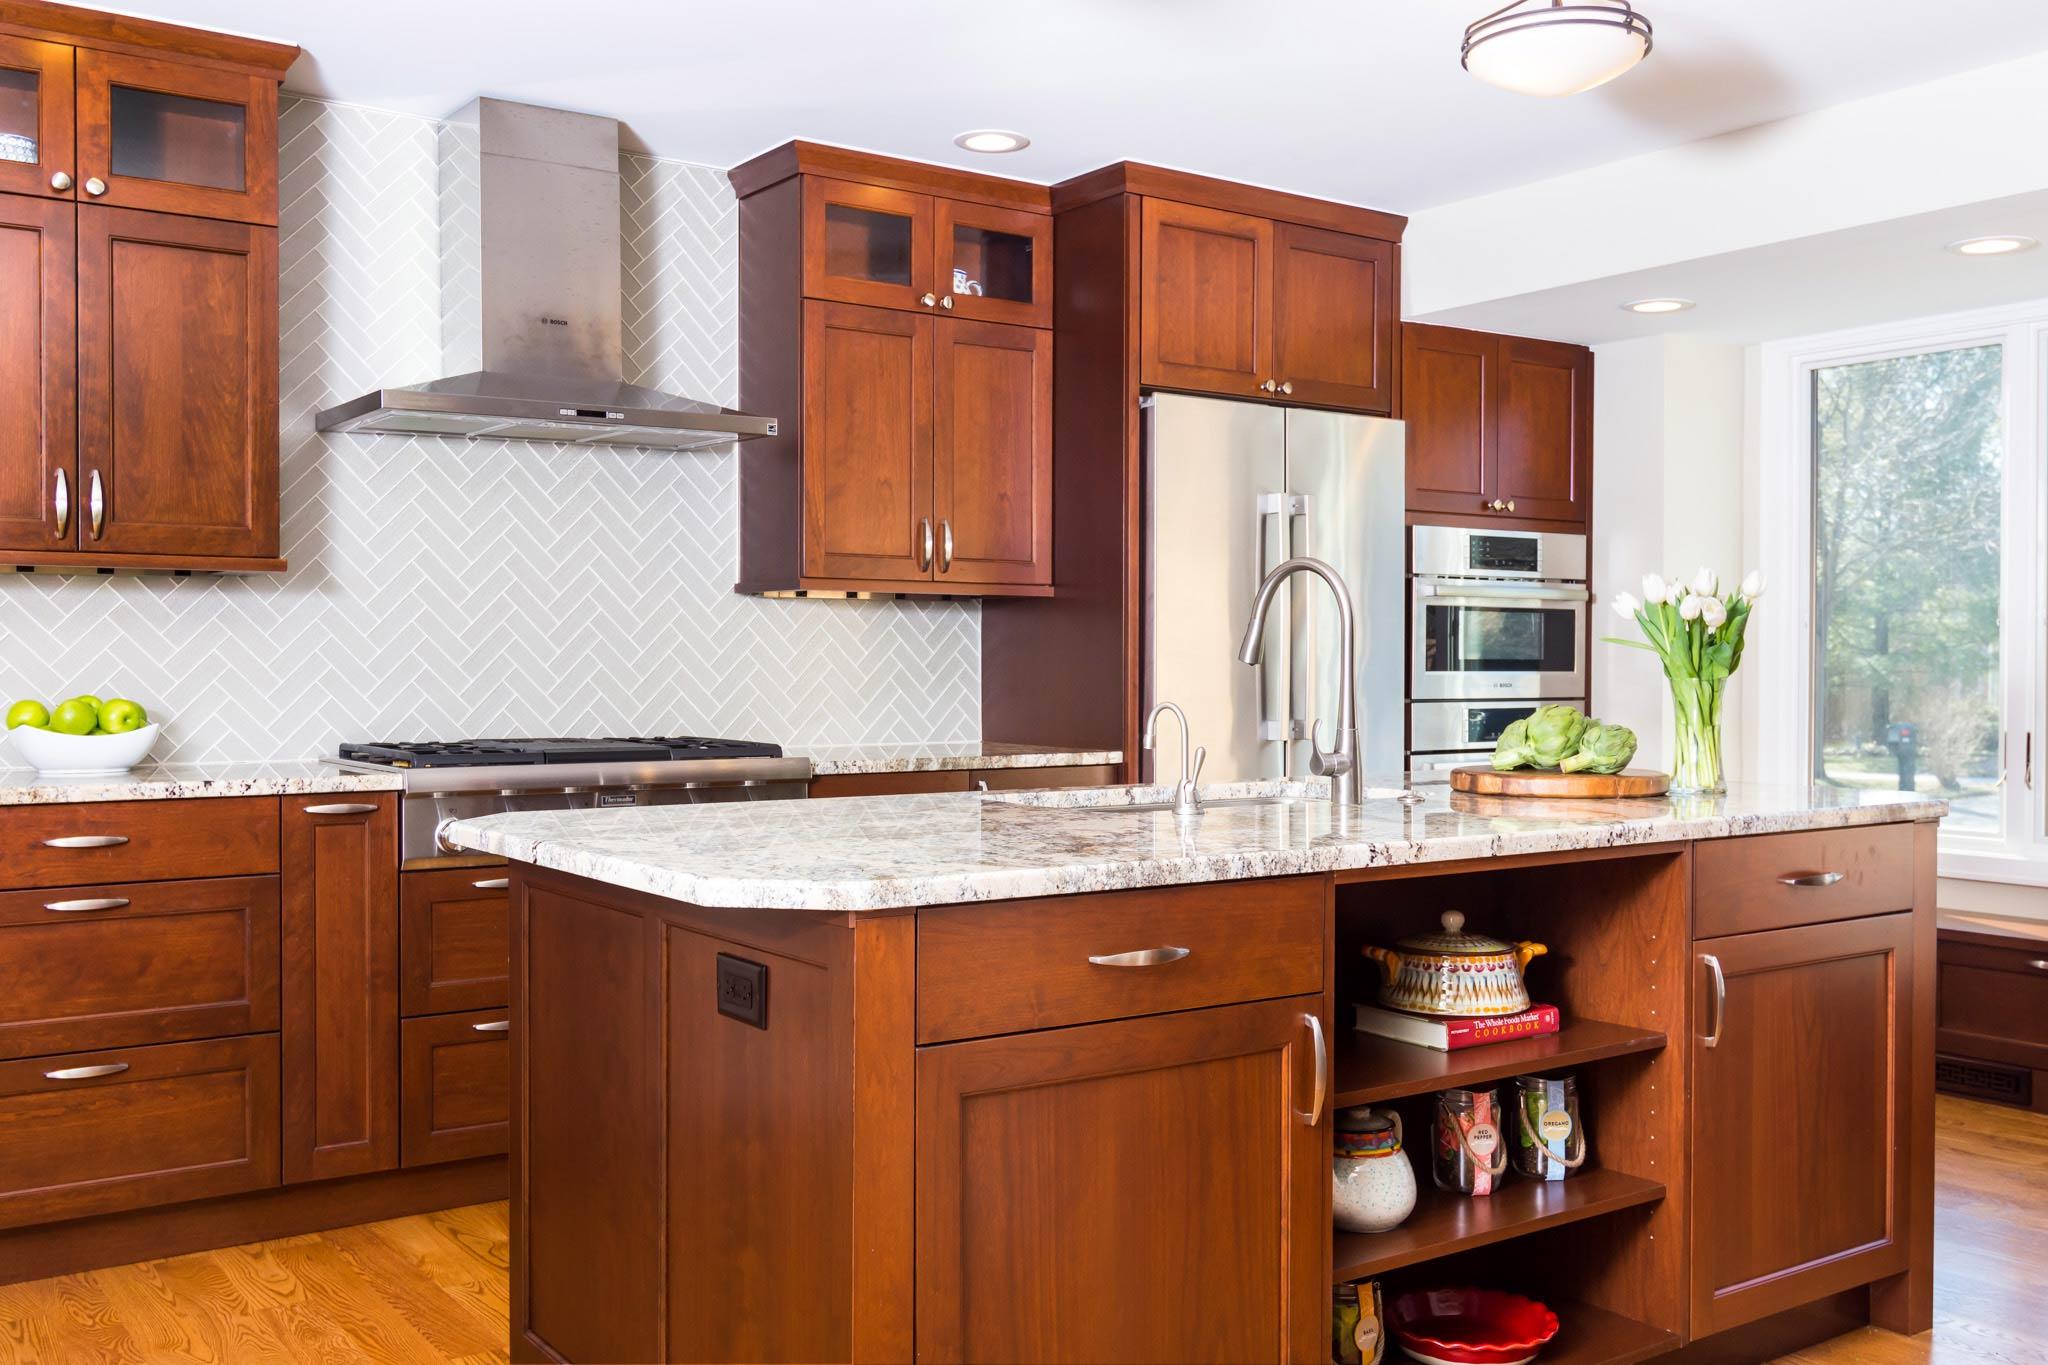 kitchen-remodeler-forward-design-ann-arbor-mi.jpg